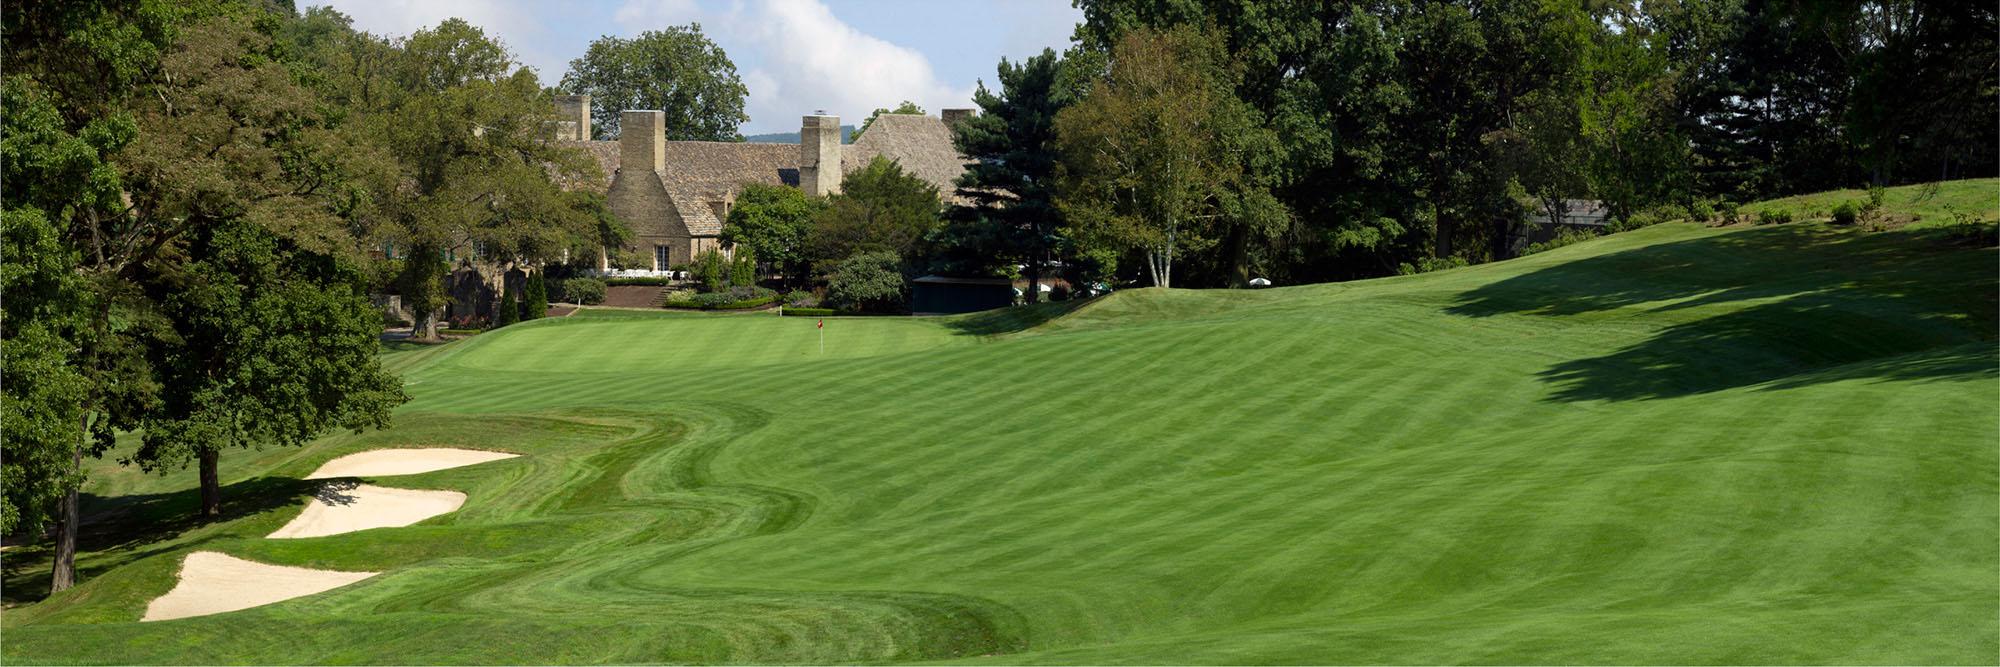 Golf Course Image - Longue Vue Club No. 18